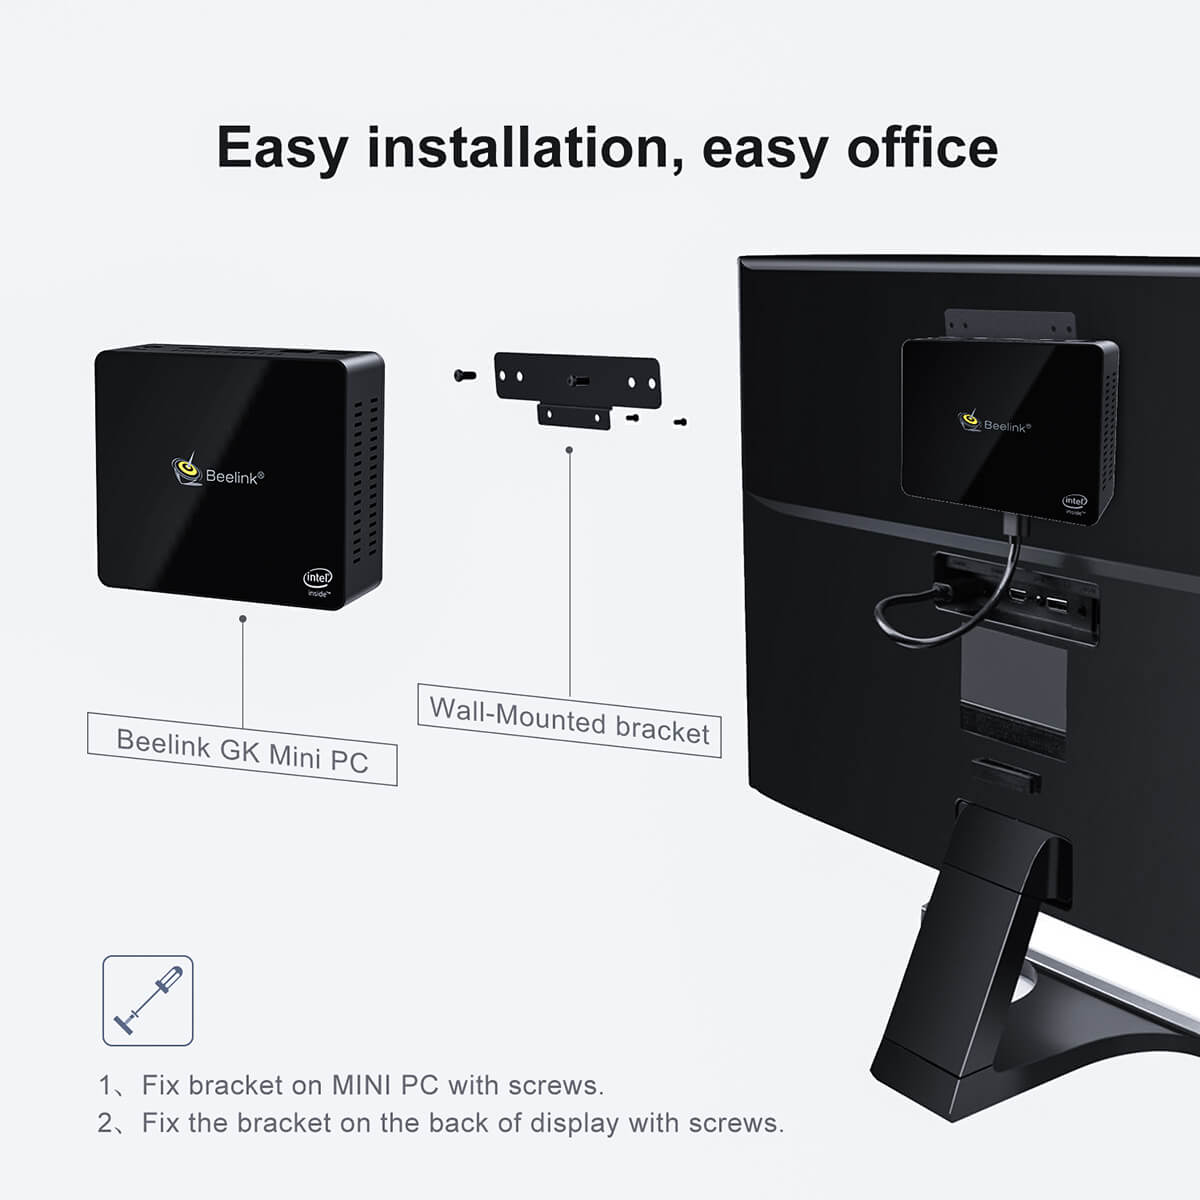 Beelink GK Mini Intel NUC Windows PC showing VESA Mount installation